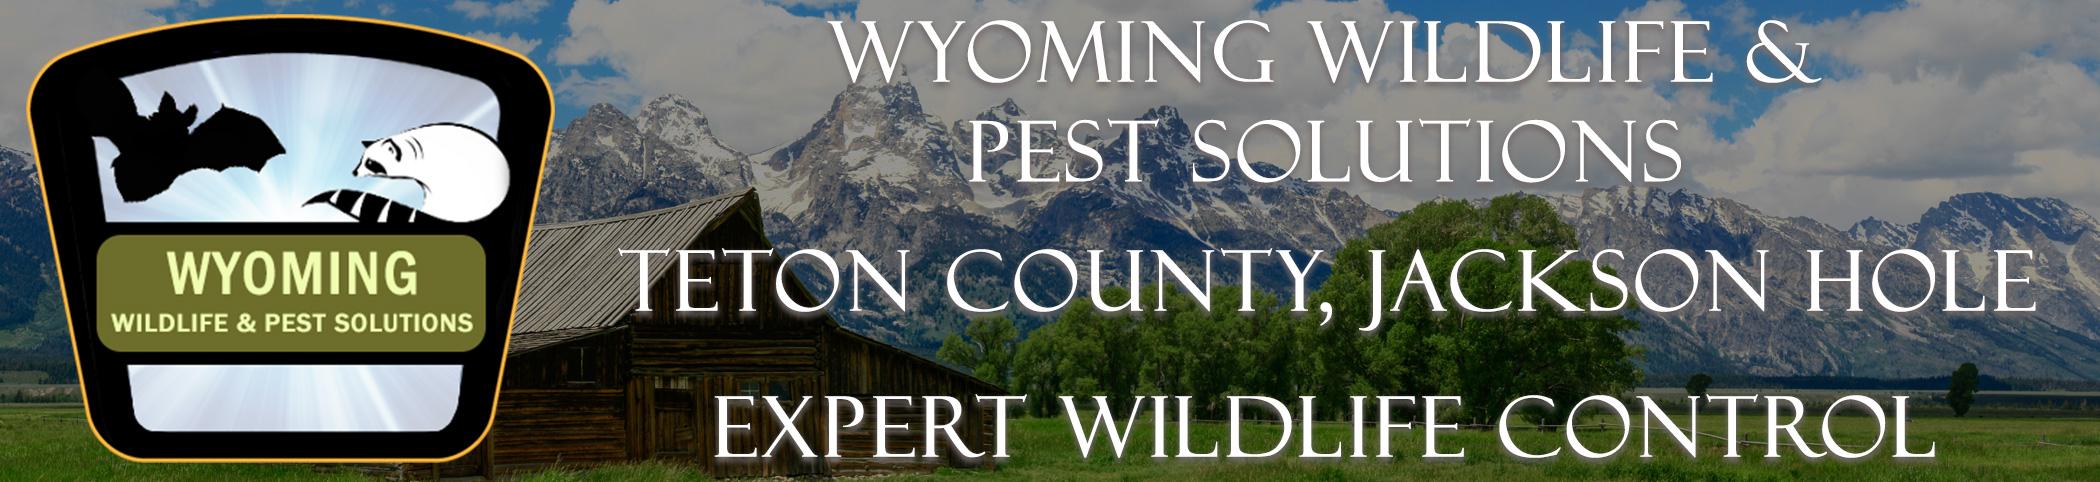 Wyoming Wildlife And Pest Solutions Teton County Jackson Hole headers